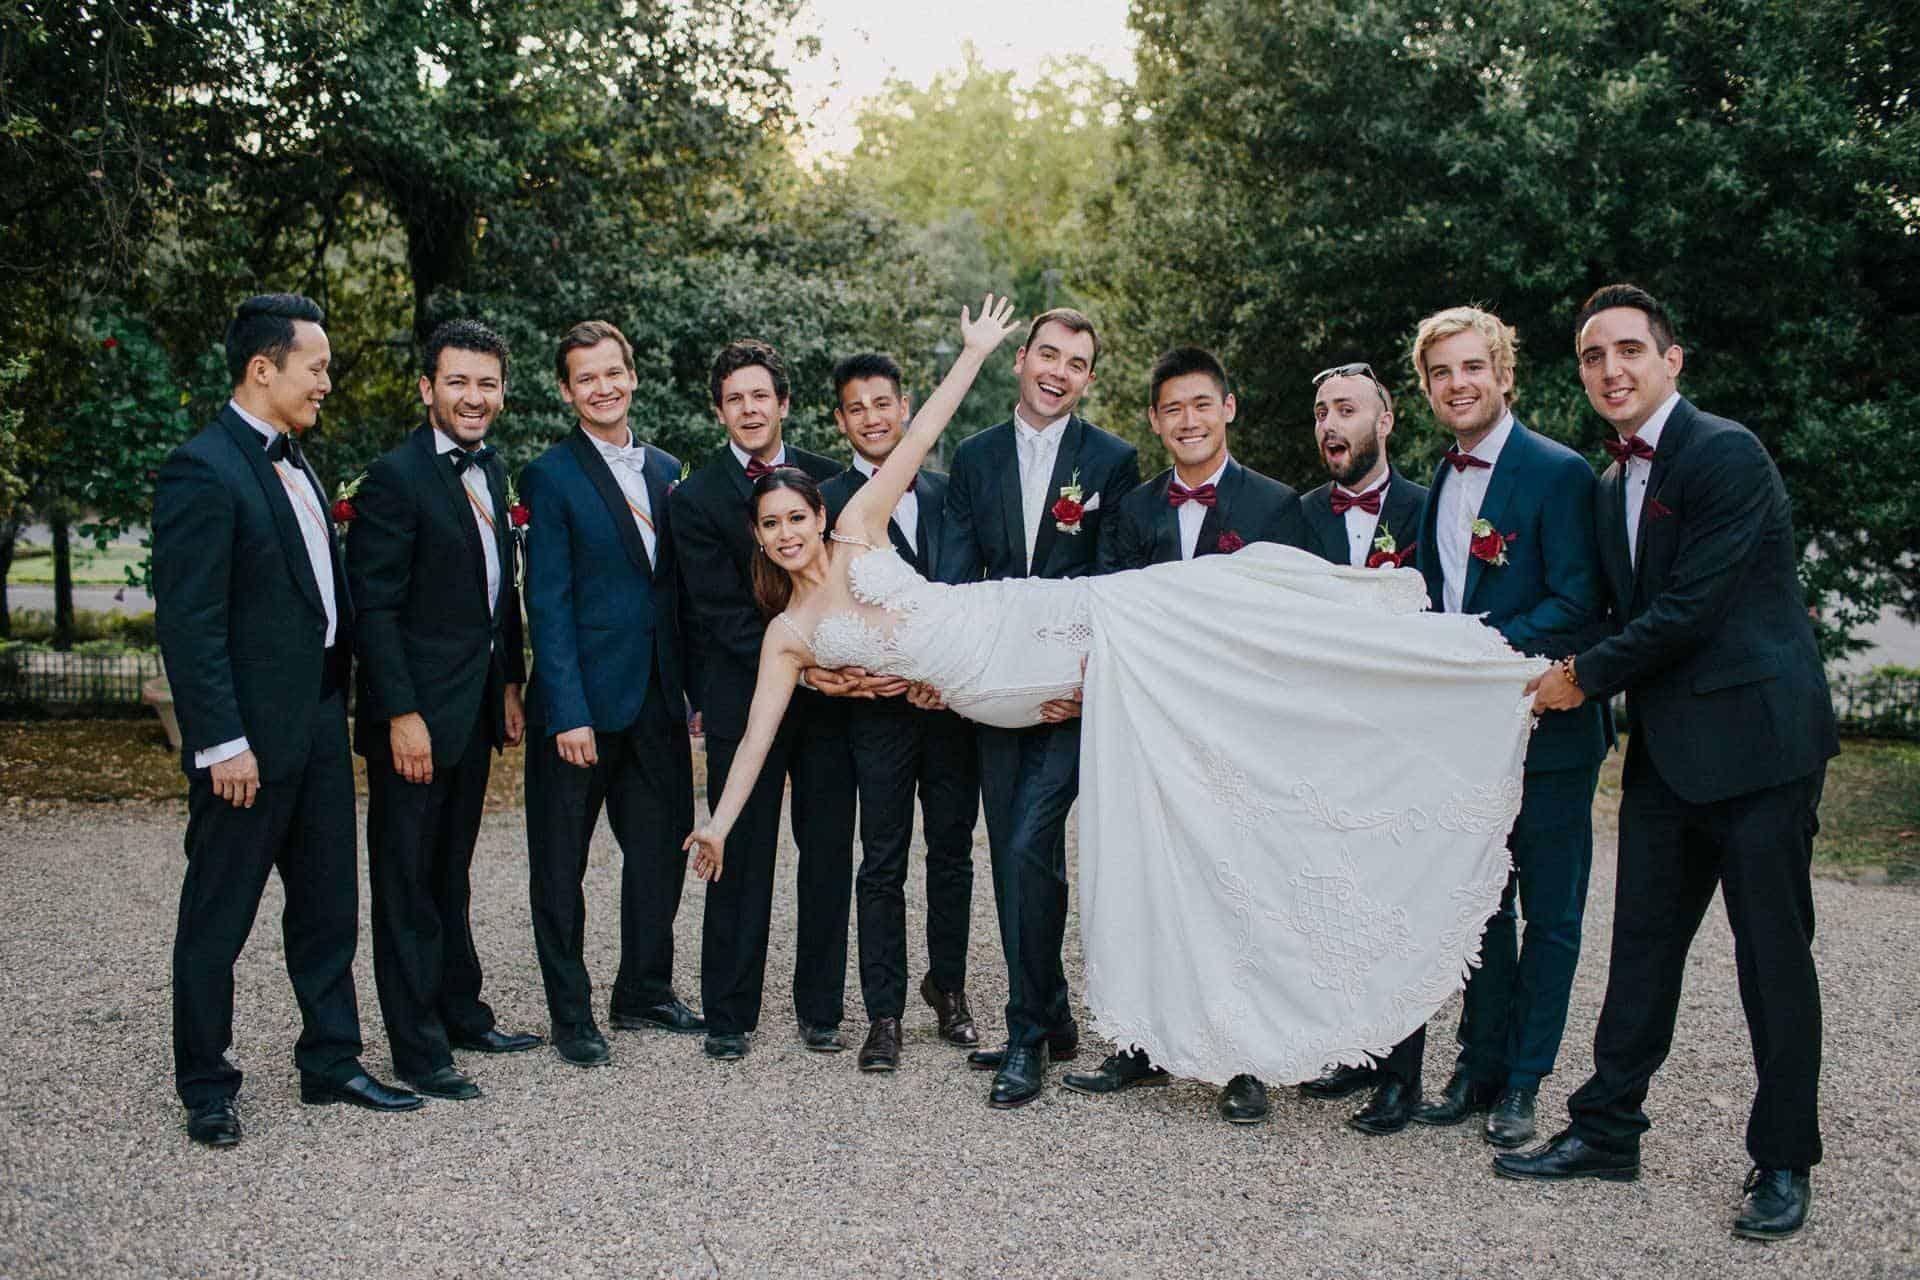 wedding la fete bride groom best men lead - Luxury Wedding Gallery